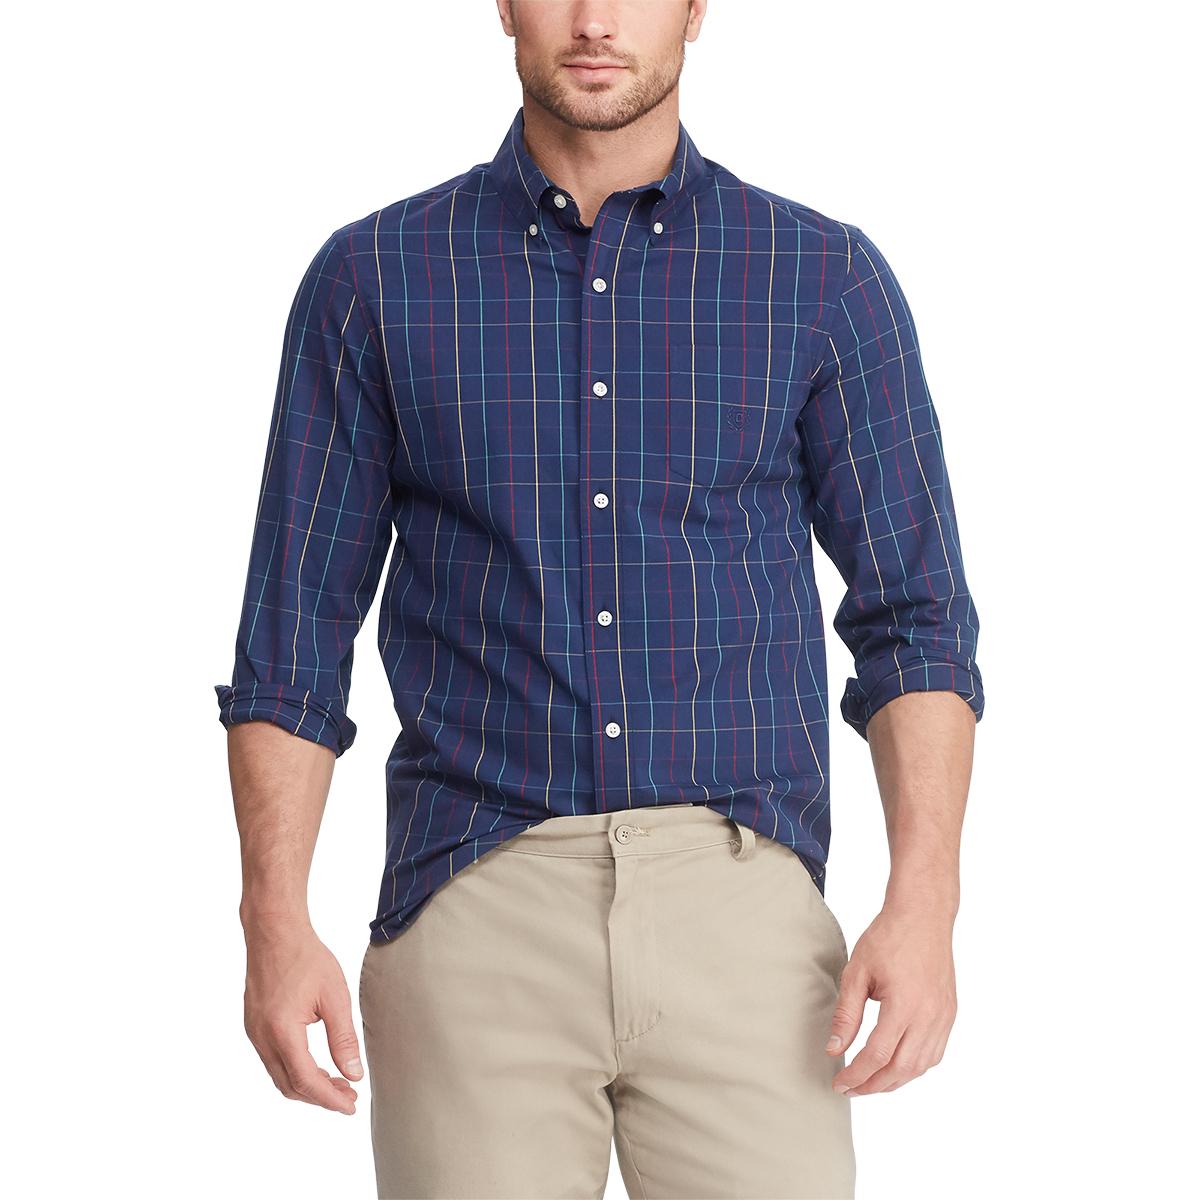 Chaps Men's Stretch Long-Sleeve Shirt - Various Patterns, XL